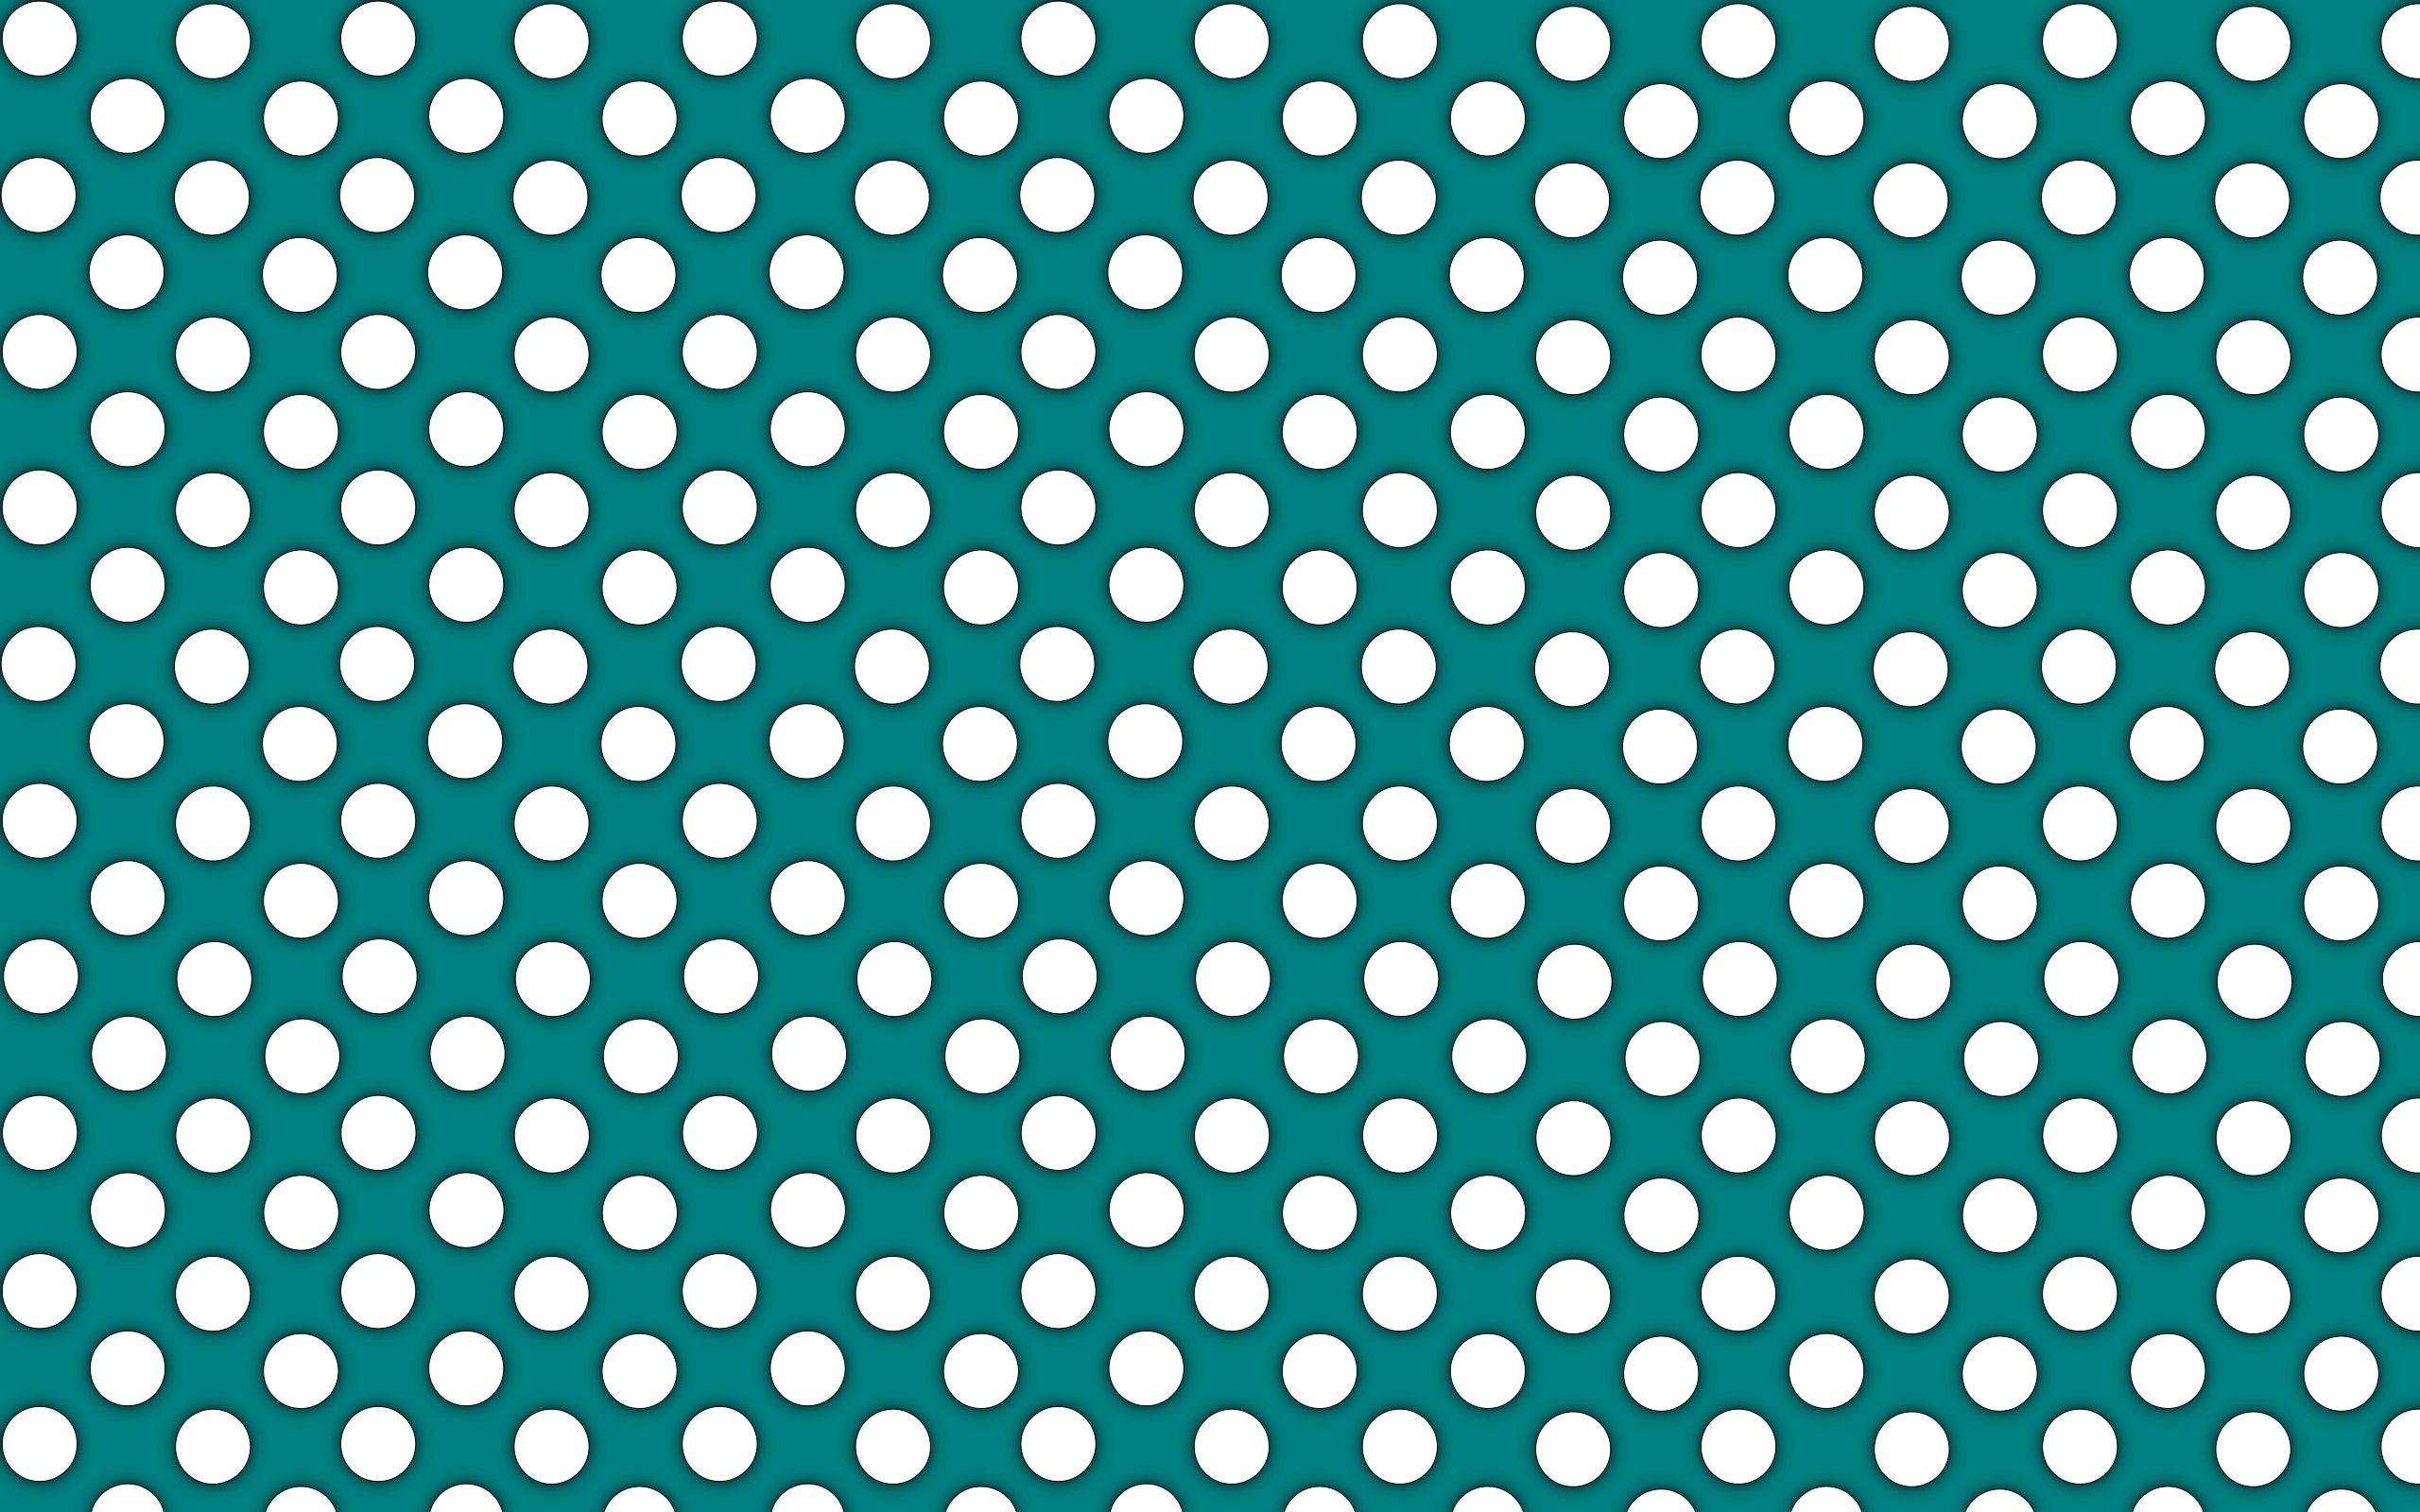 Cute Zig Zag Wallpapers Teal Backgrounds Download Free Pixelstalk Net